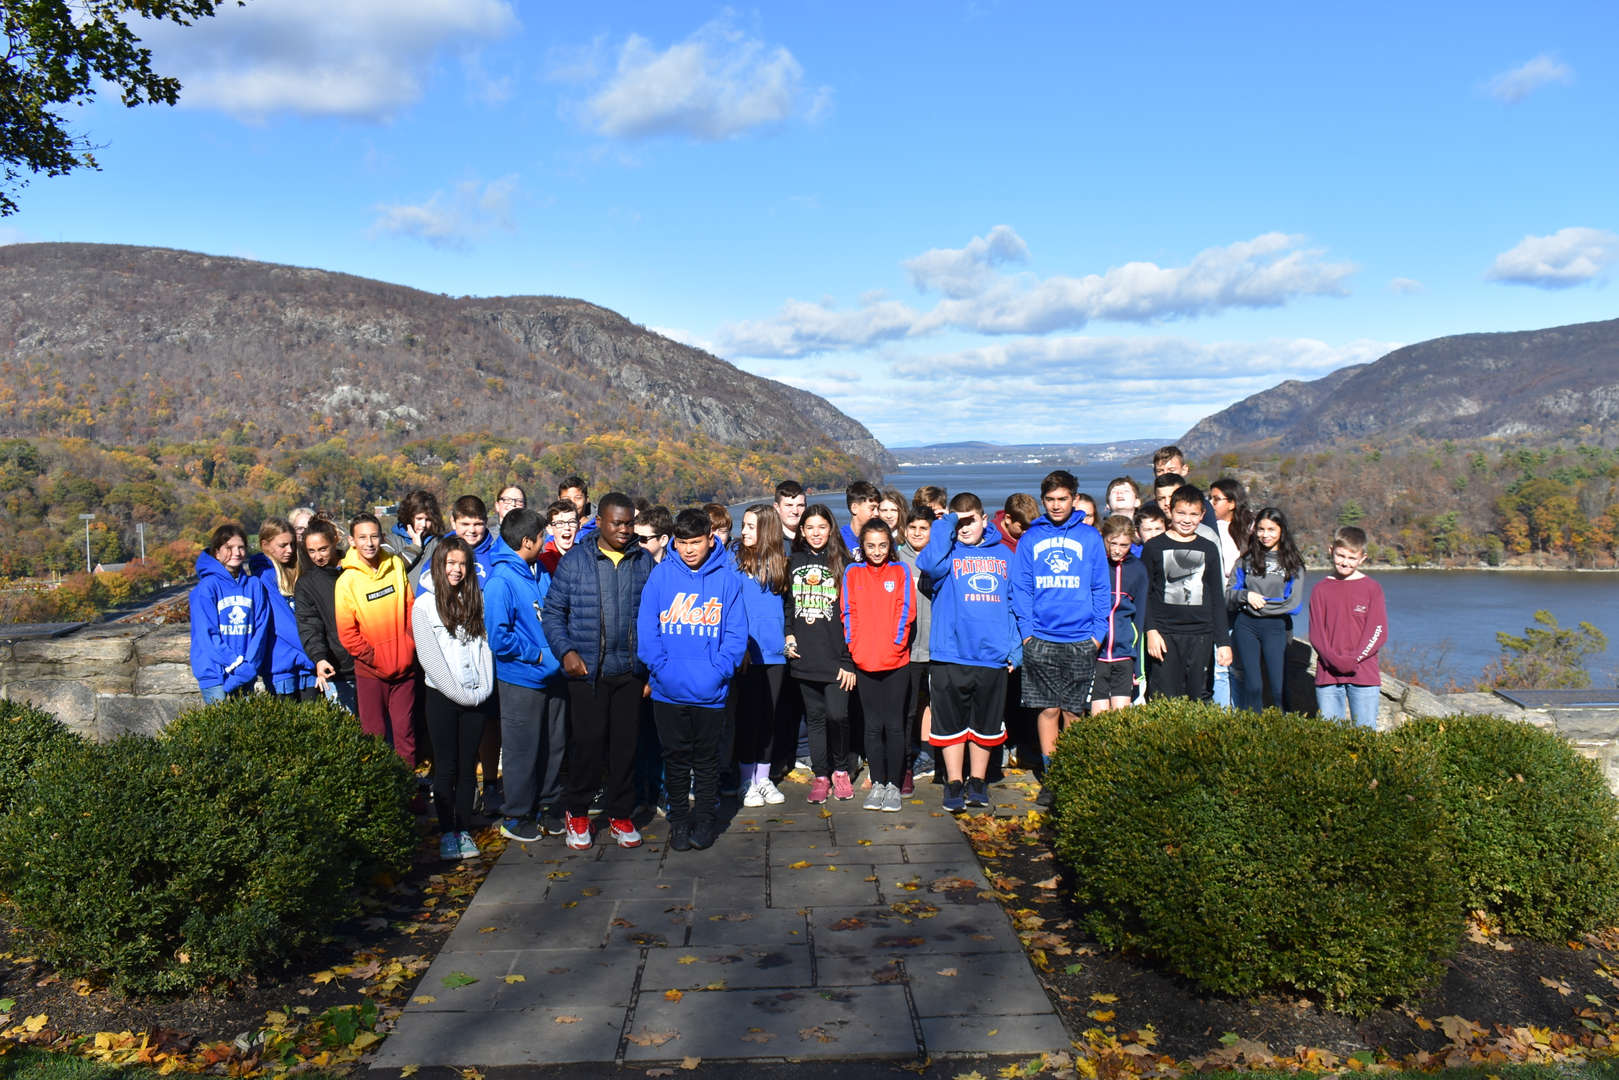 West Point trip